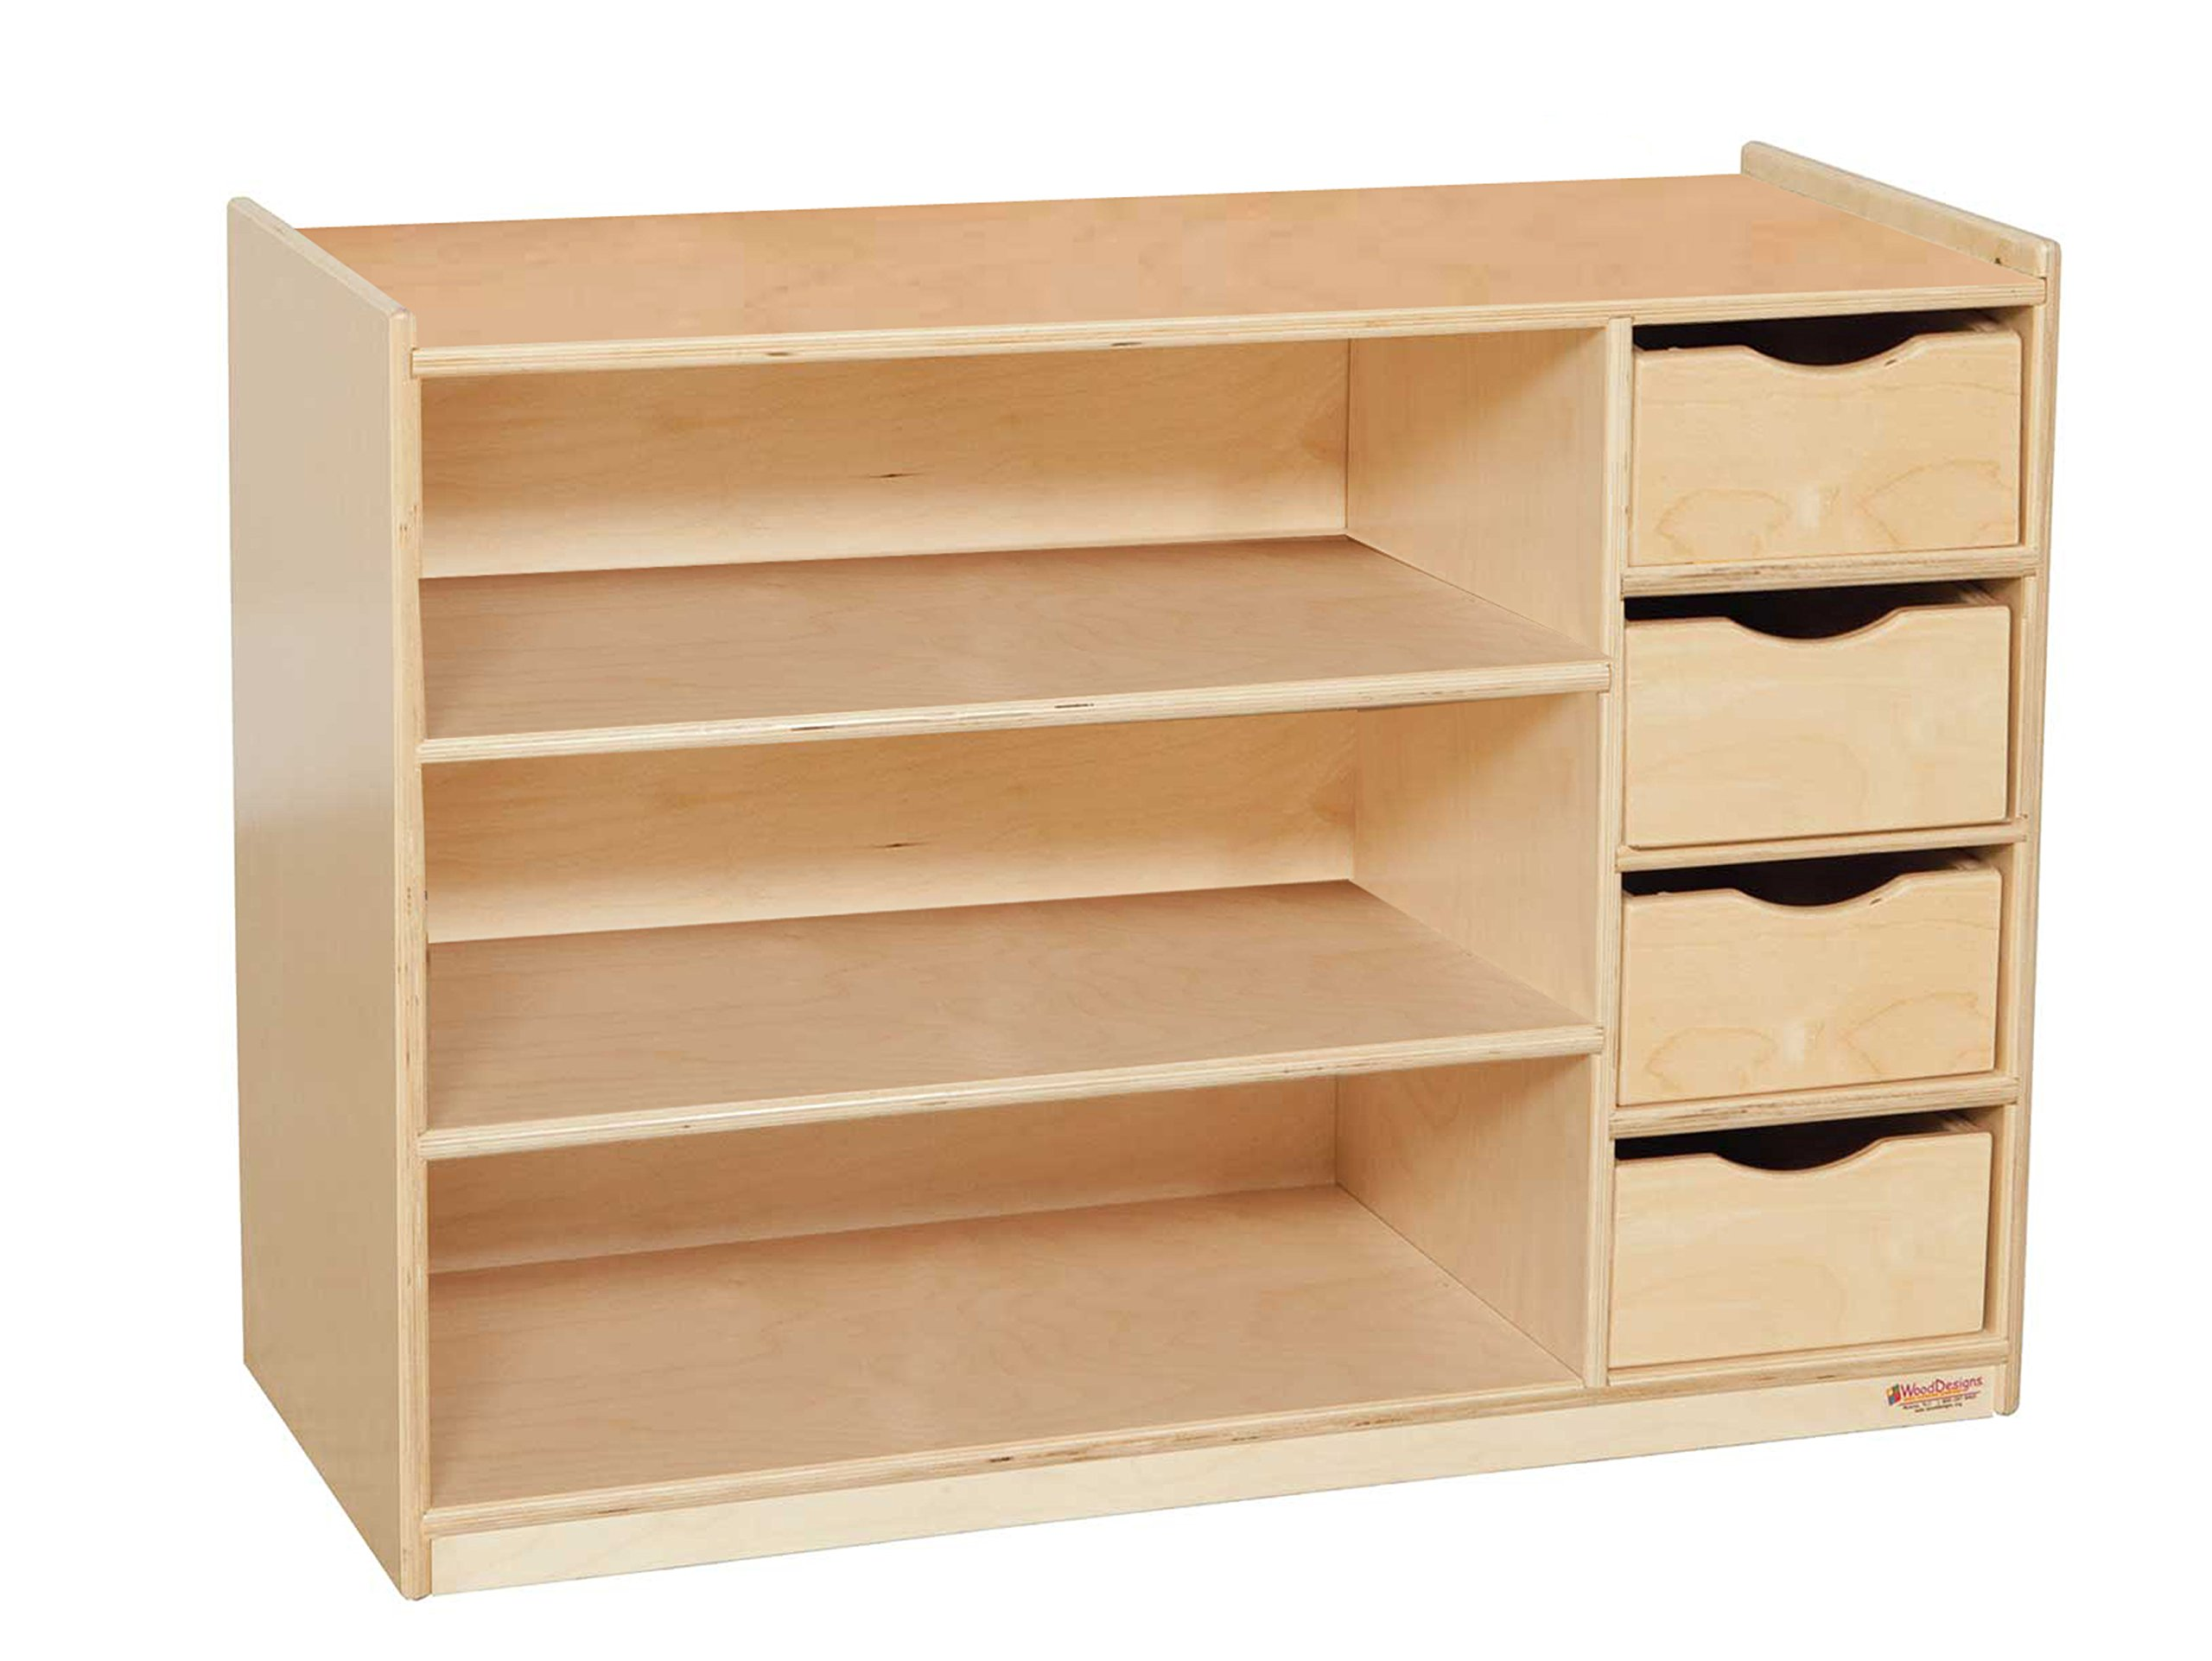 Wood Designs WD14475 Storage Center with Drawers, 26 x 36 x 15'' (H x W x D)